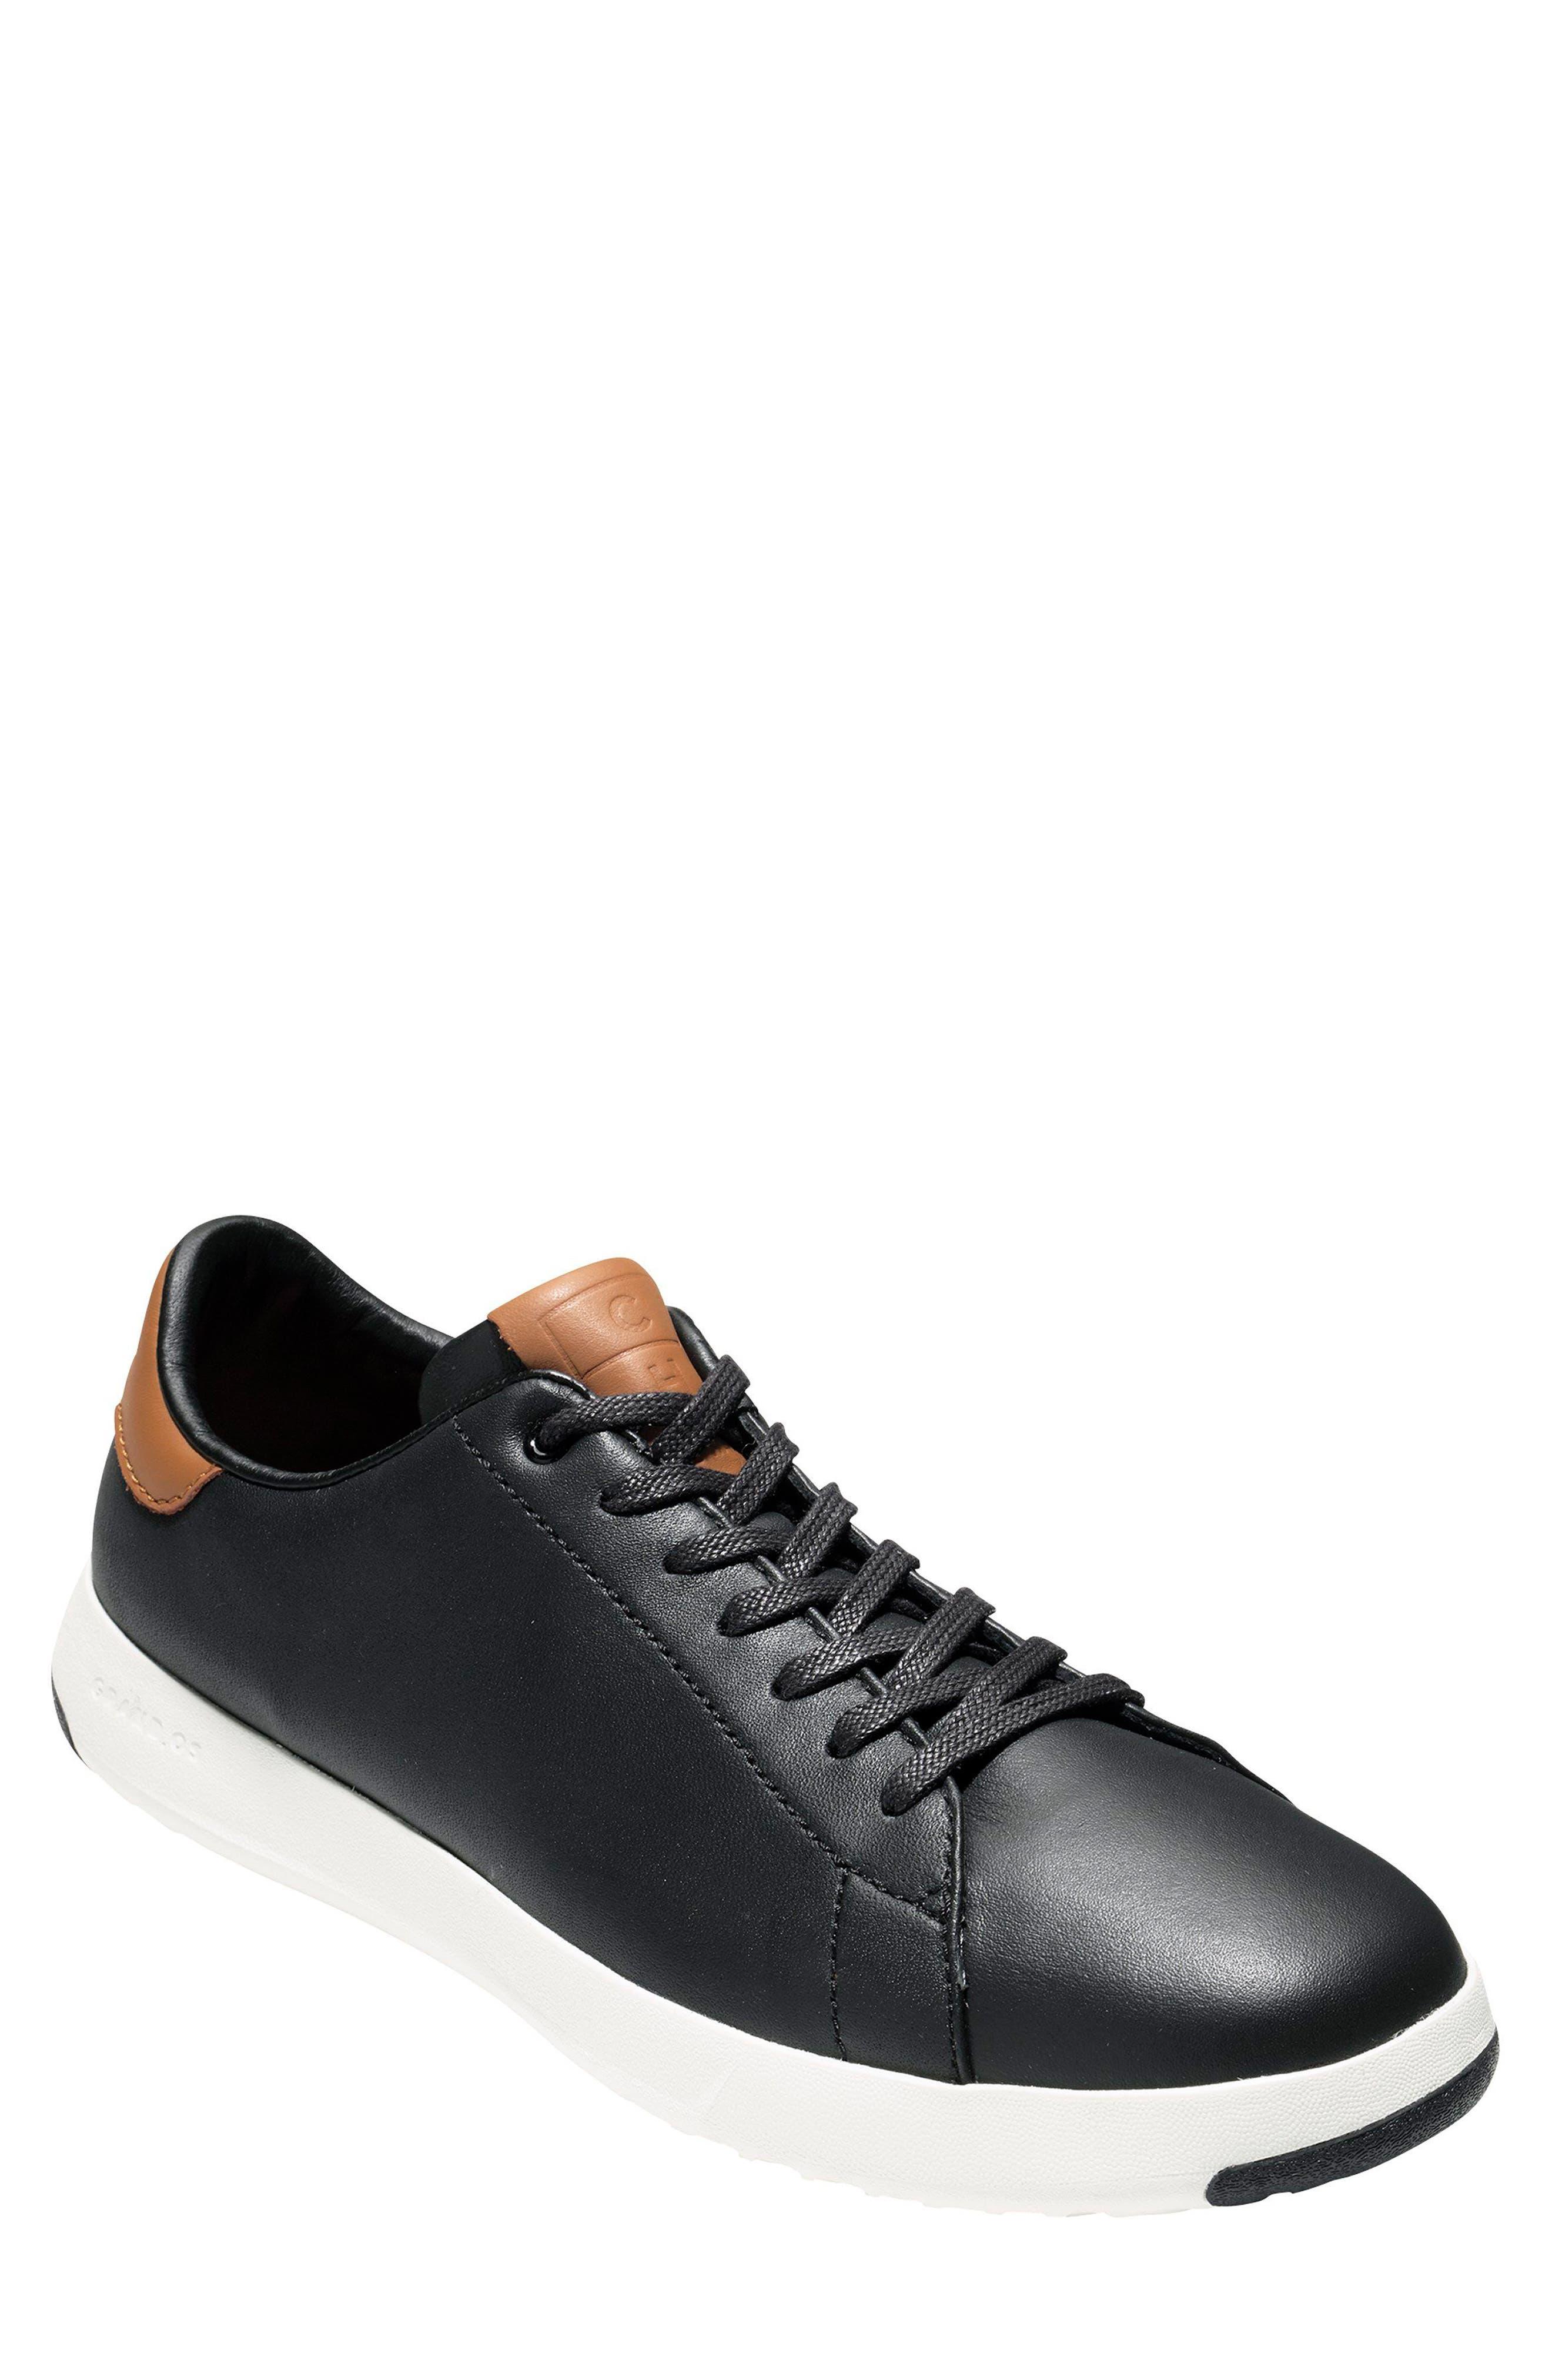 GrandPro Tennis Sneaker,                             Main thumbnail 1, color,                             BLACK/ BRITISH TAN